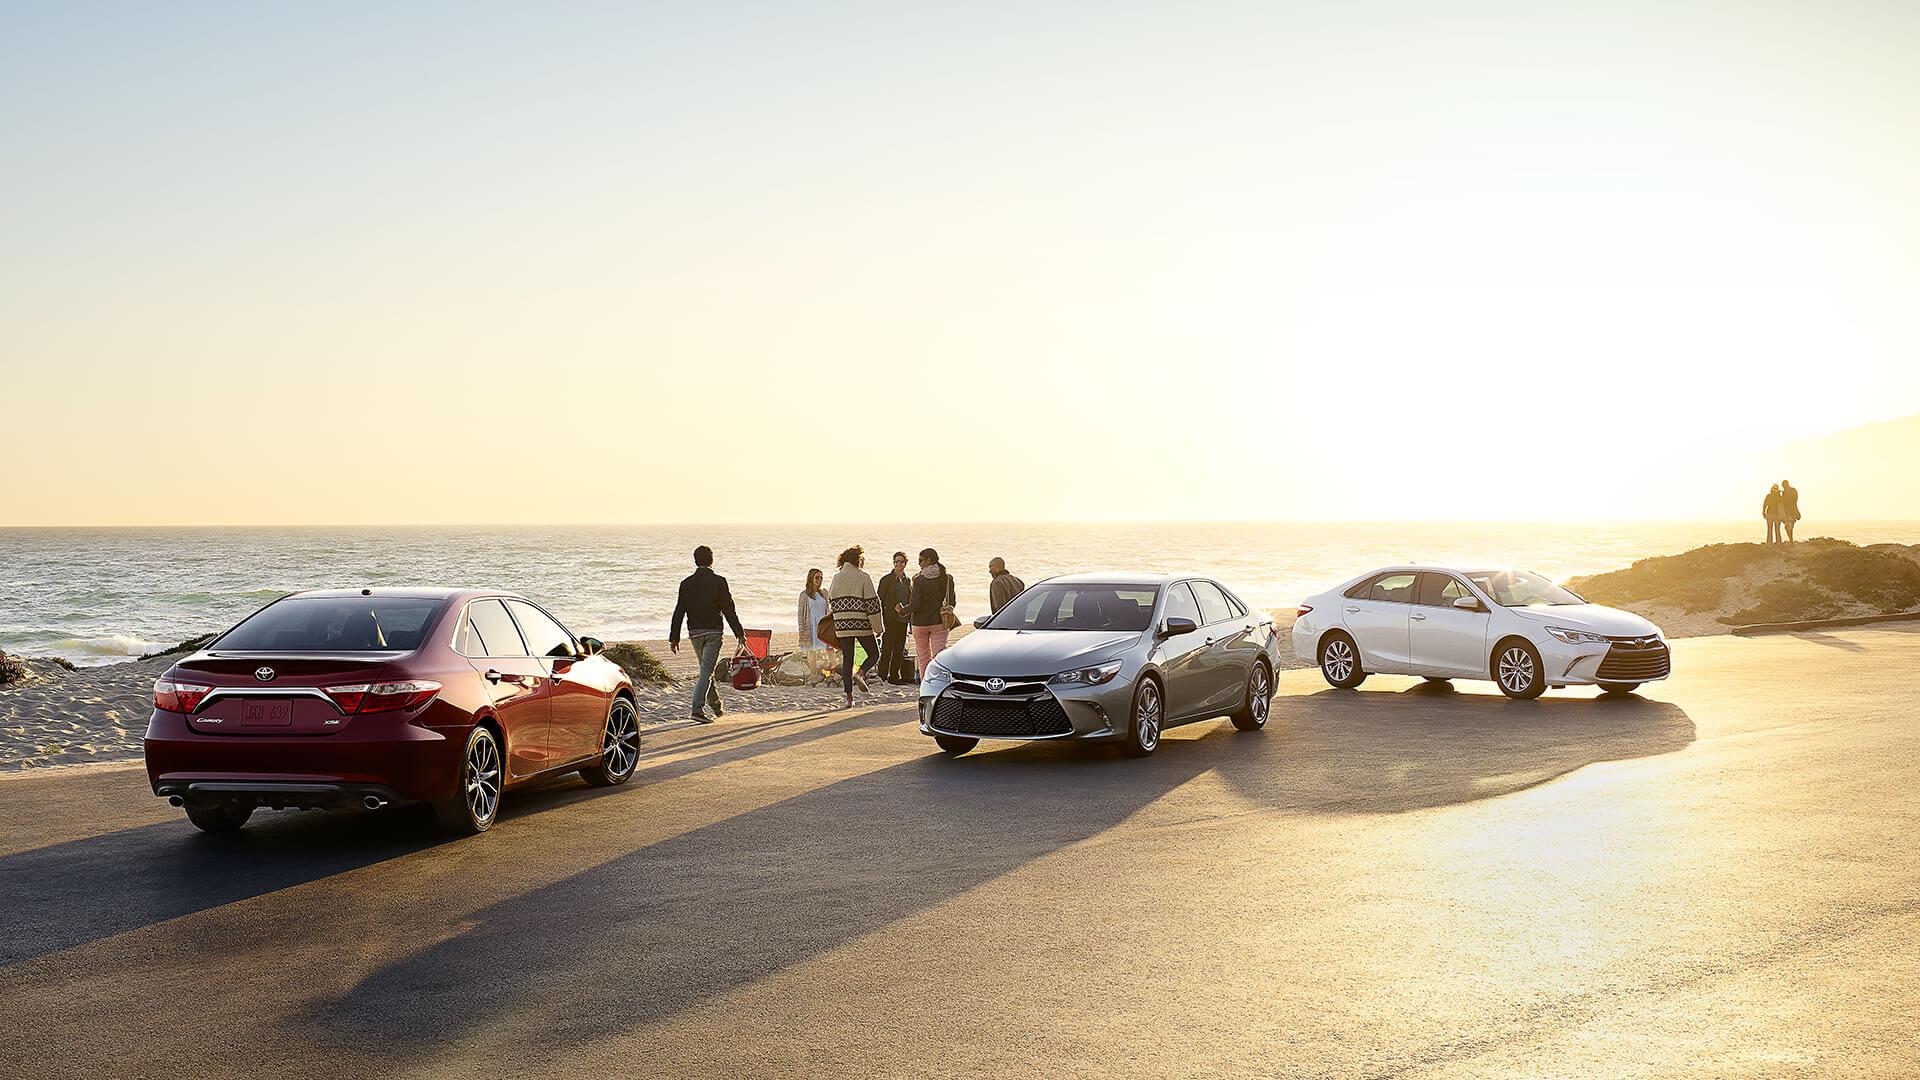 2017 Toyota Camry Ocean